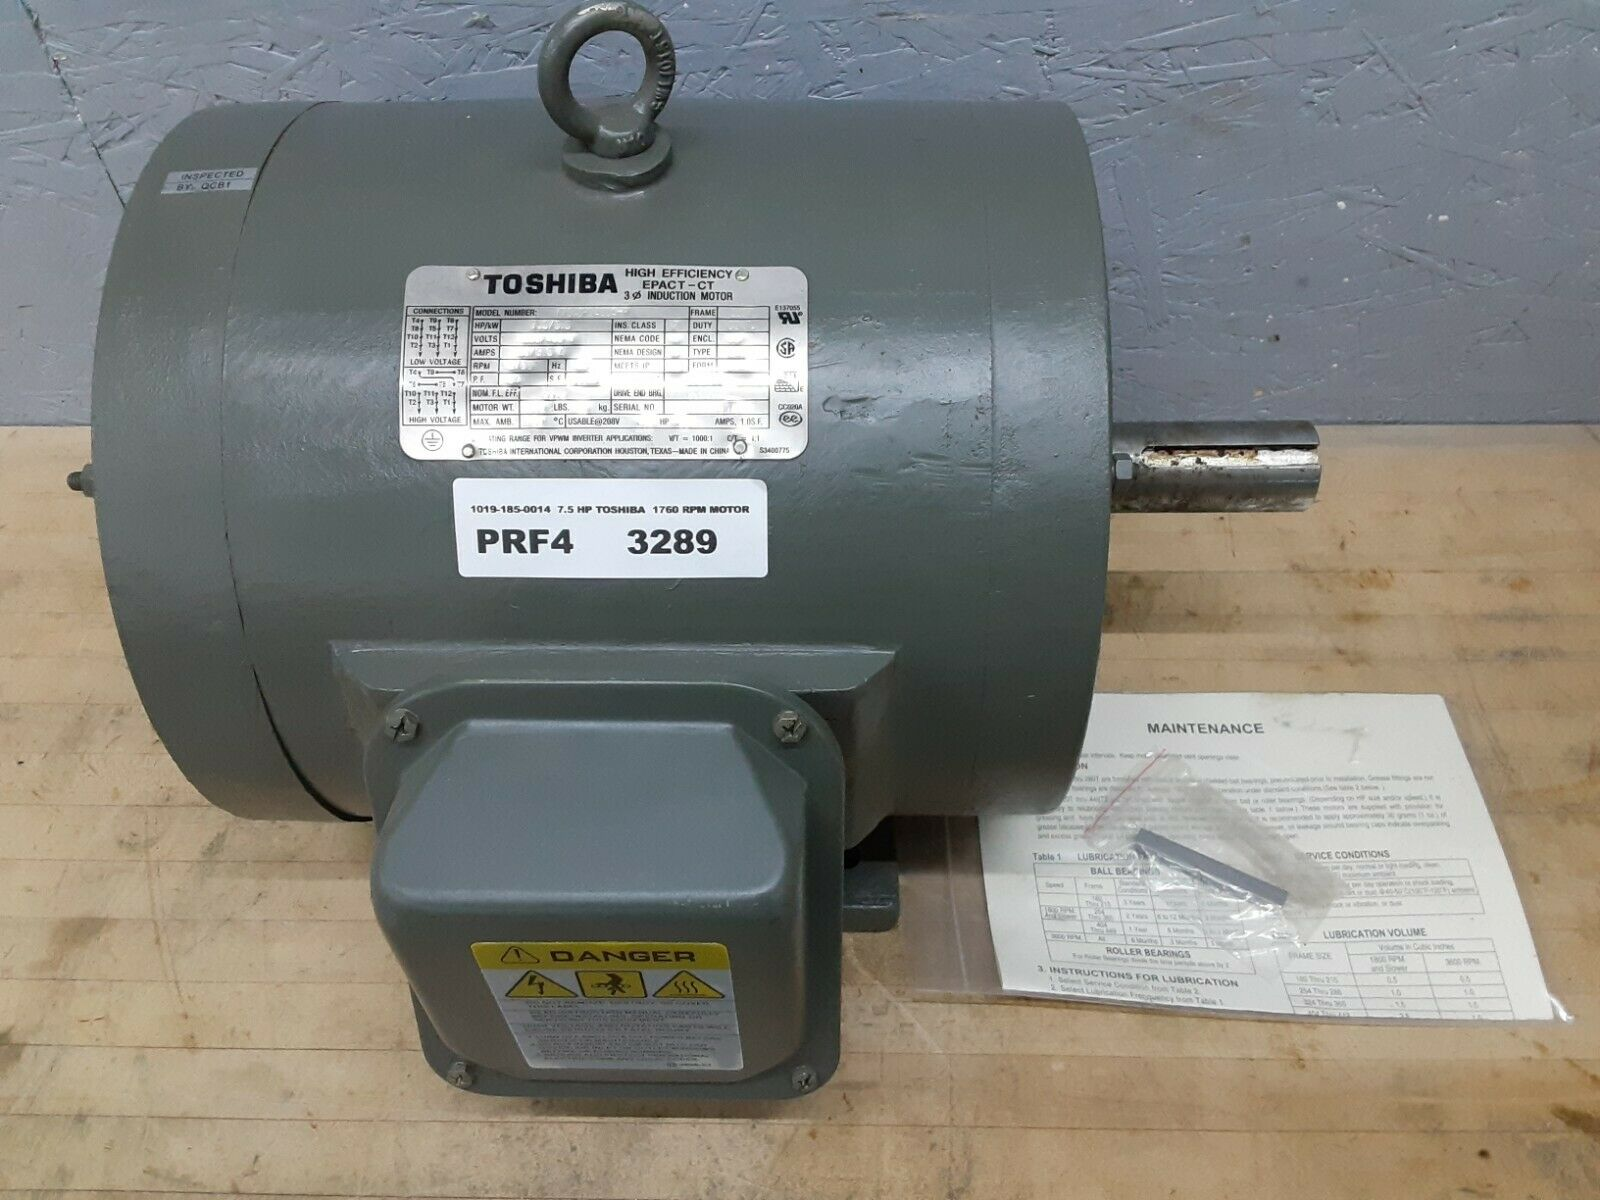 SQUARE D ELECTRIC MAGNETIC MOTOR STARTER CONTROL 7.5HP 230V 3PH 8911DPSG23V09